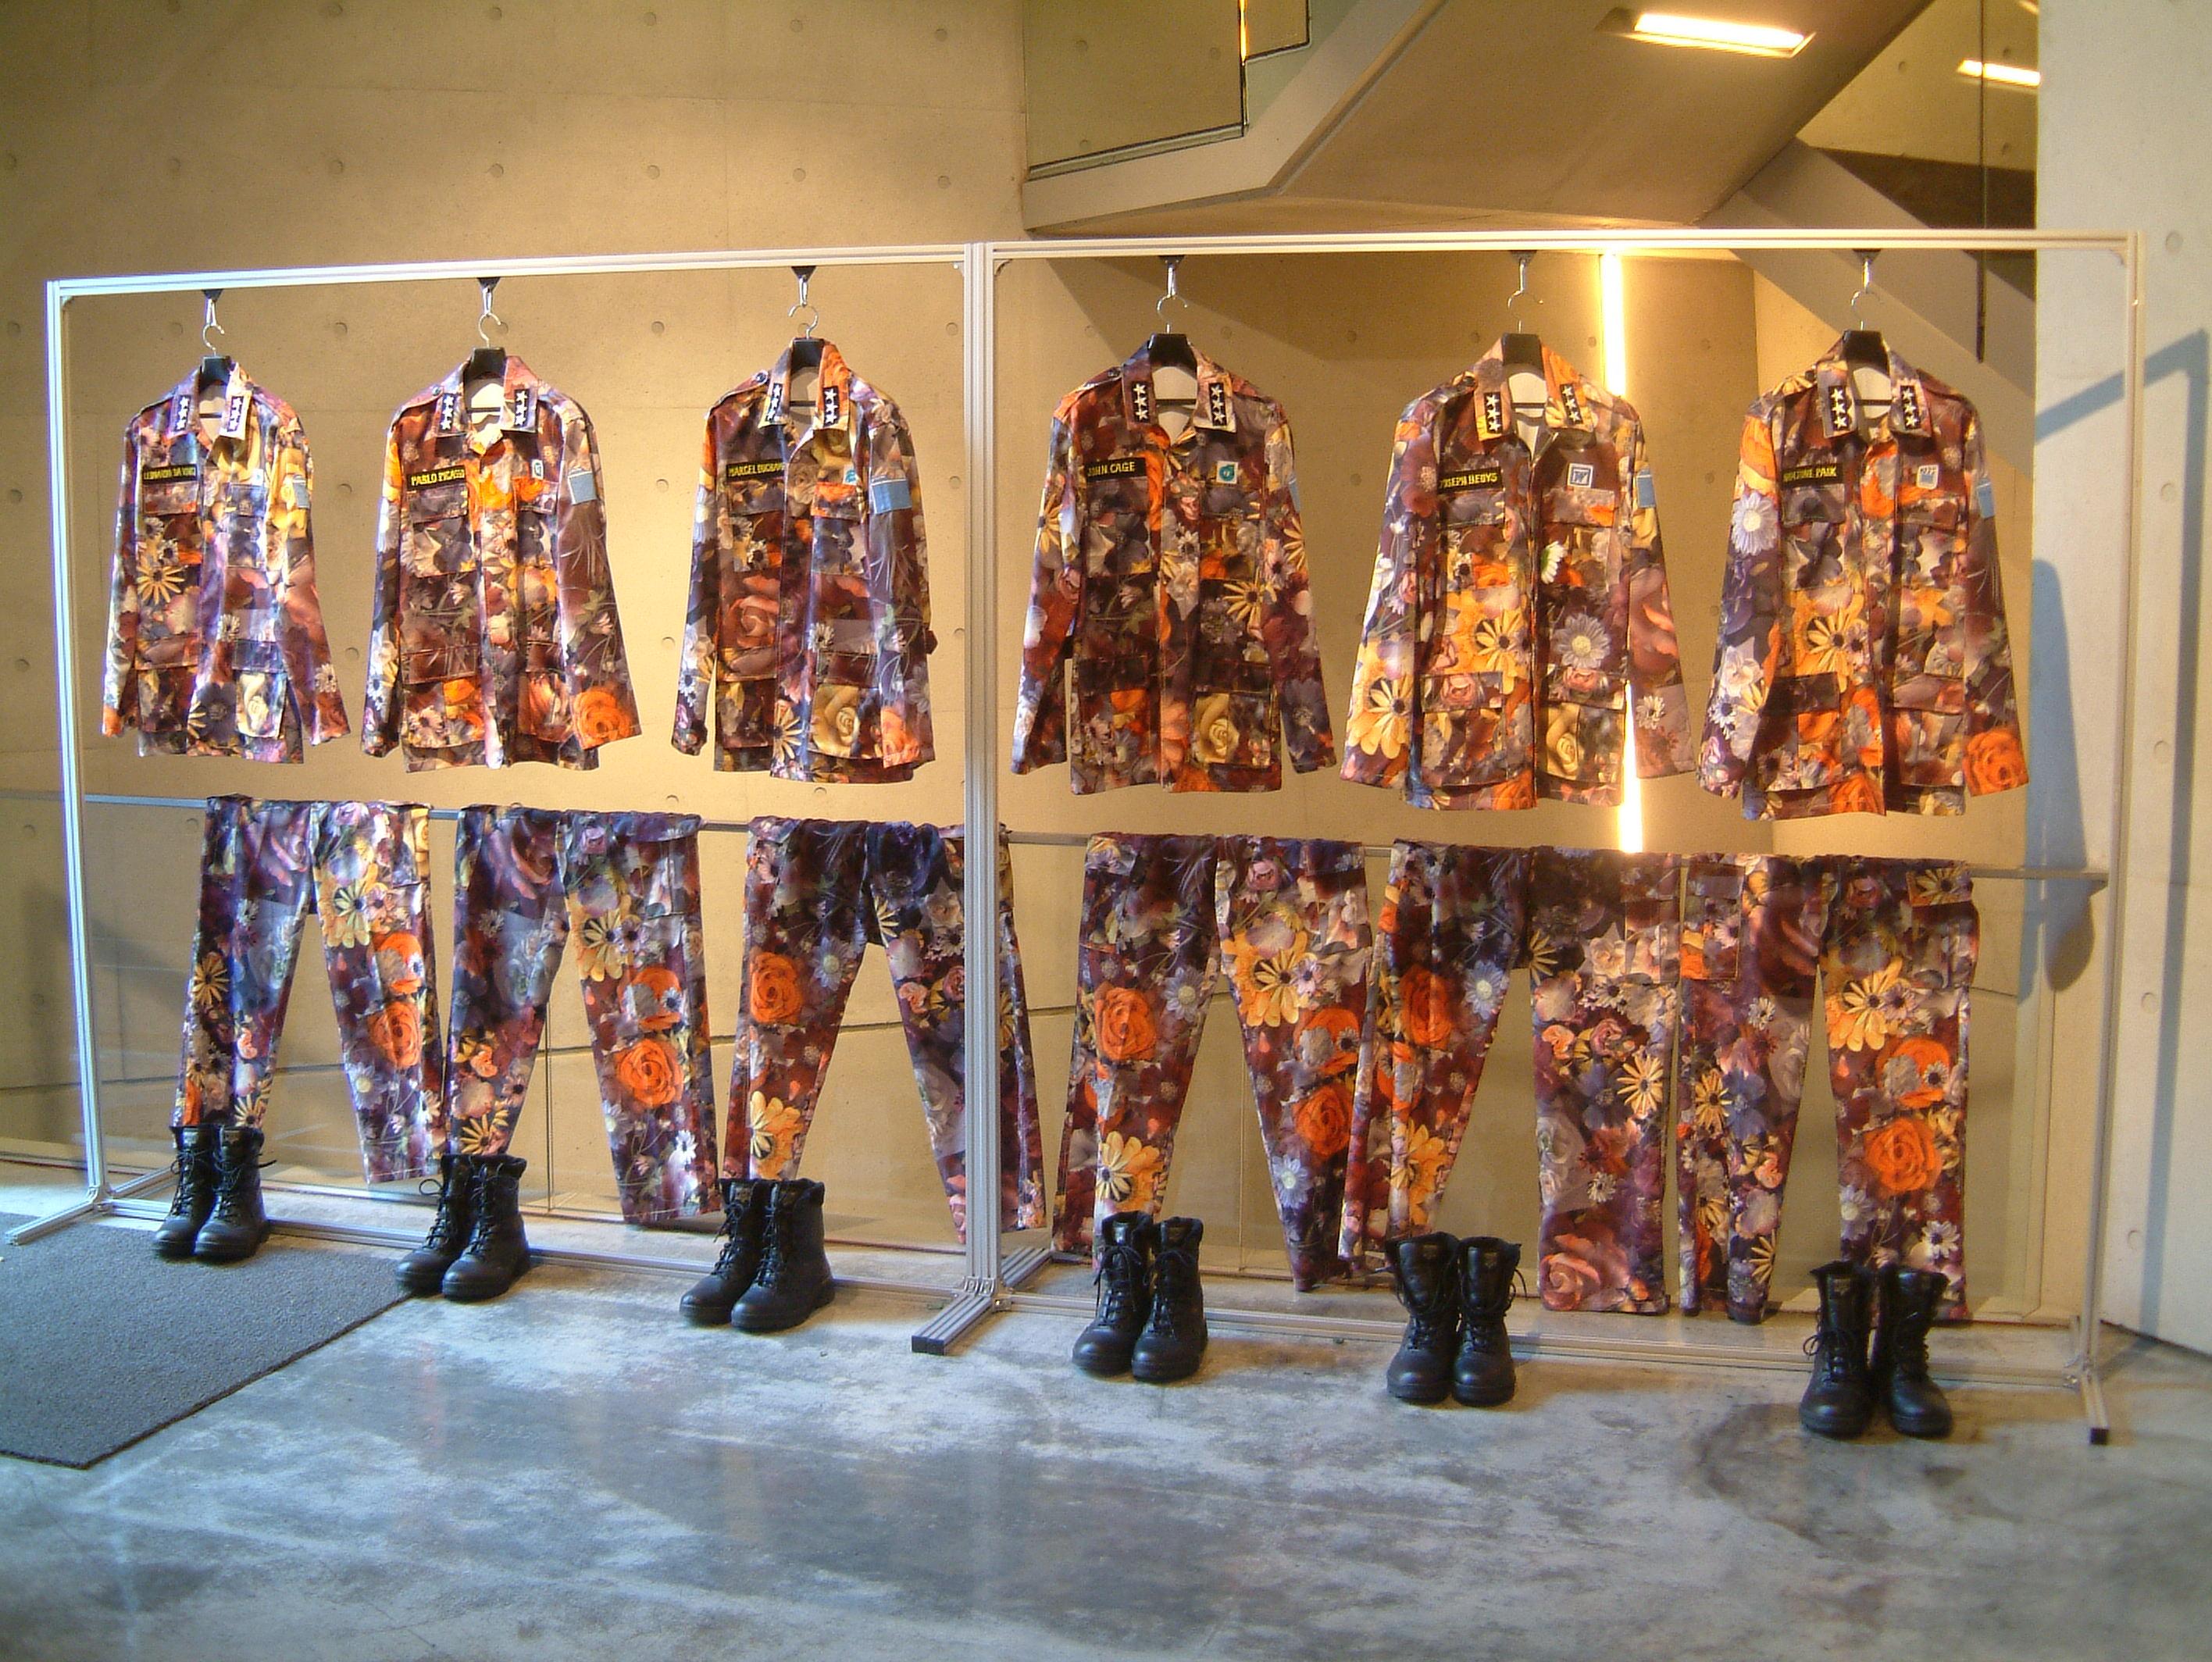 Yong Baek Lee Solo Exhibition: Angel-Soldier